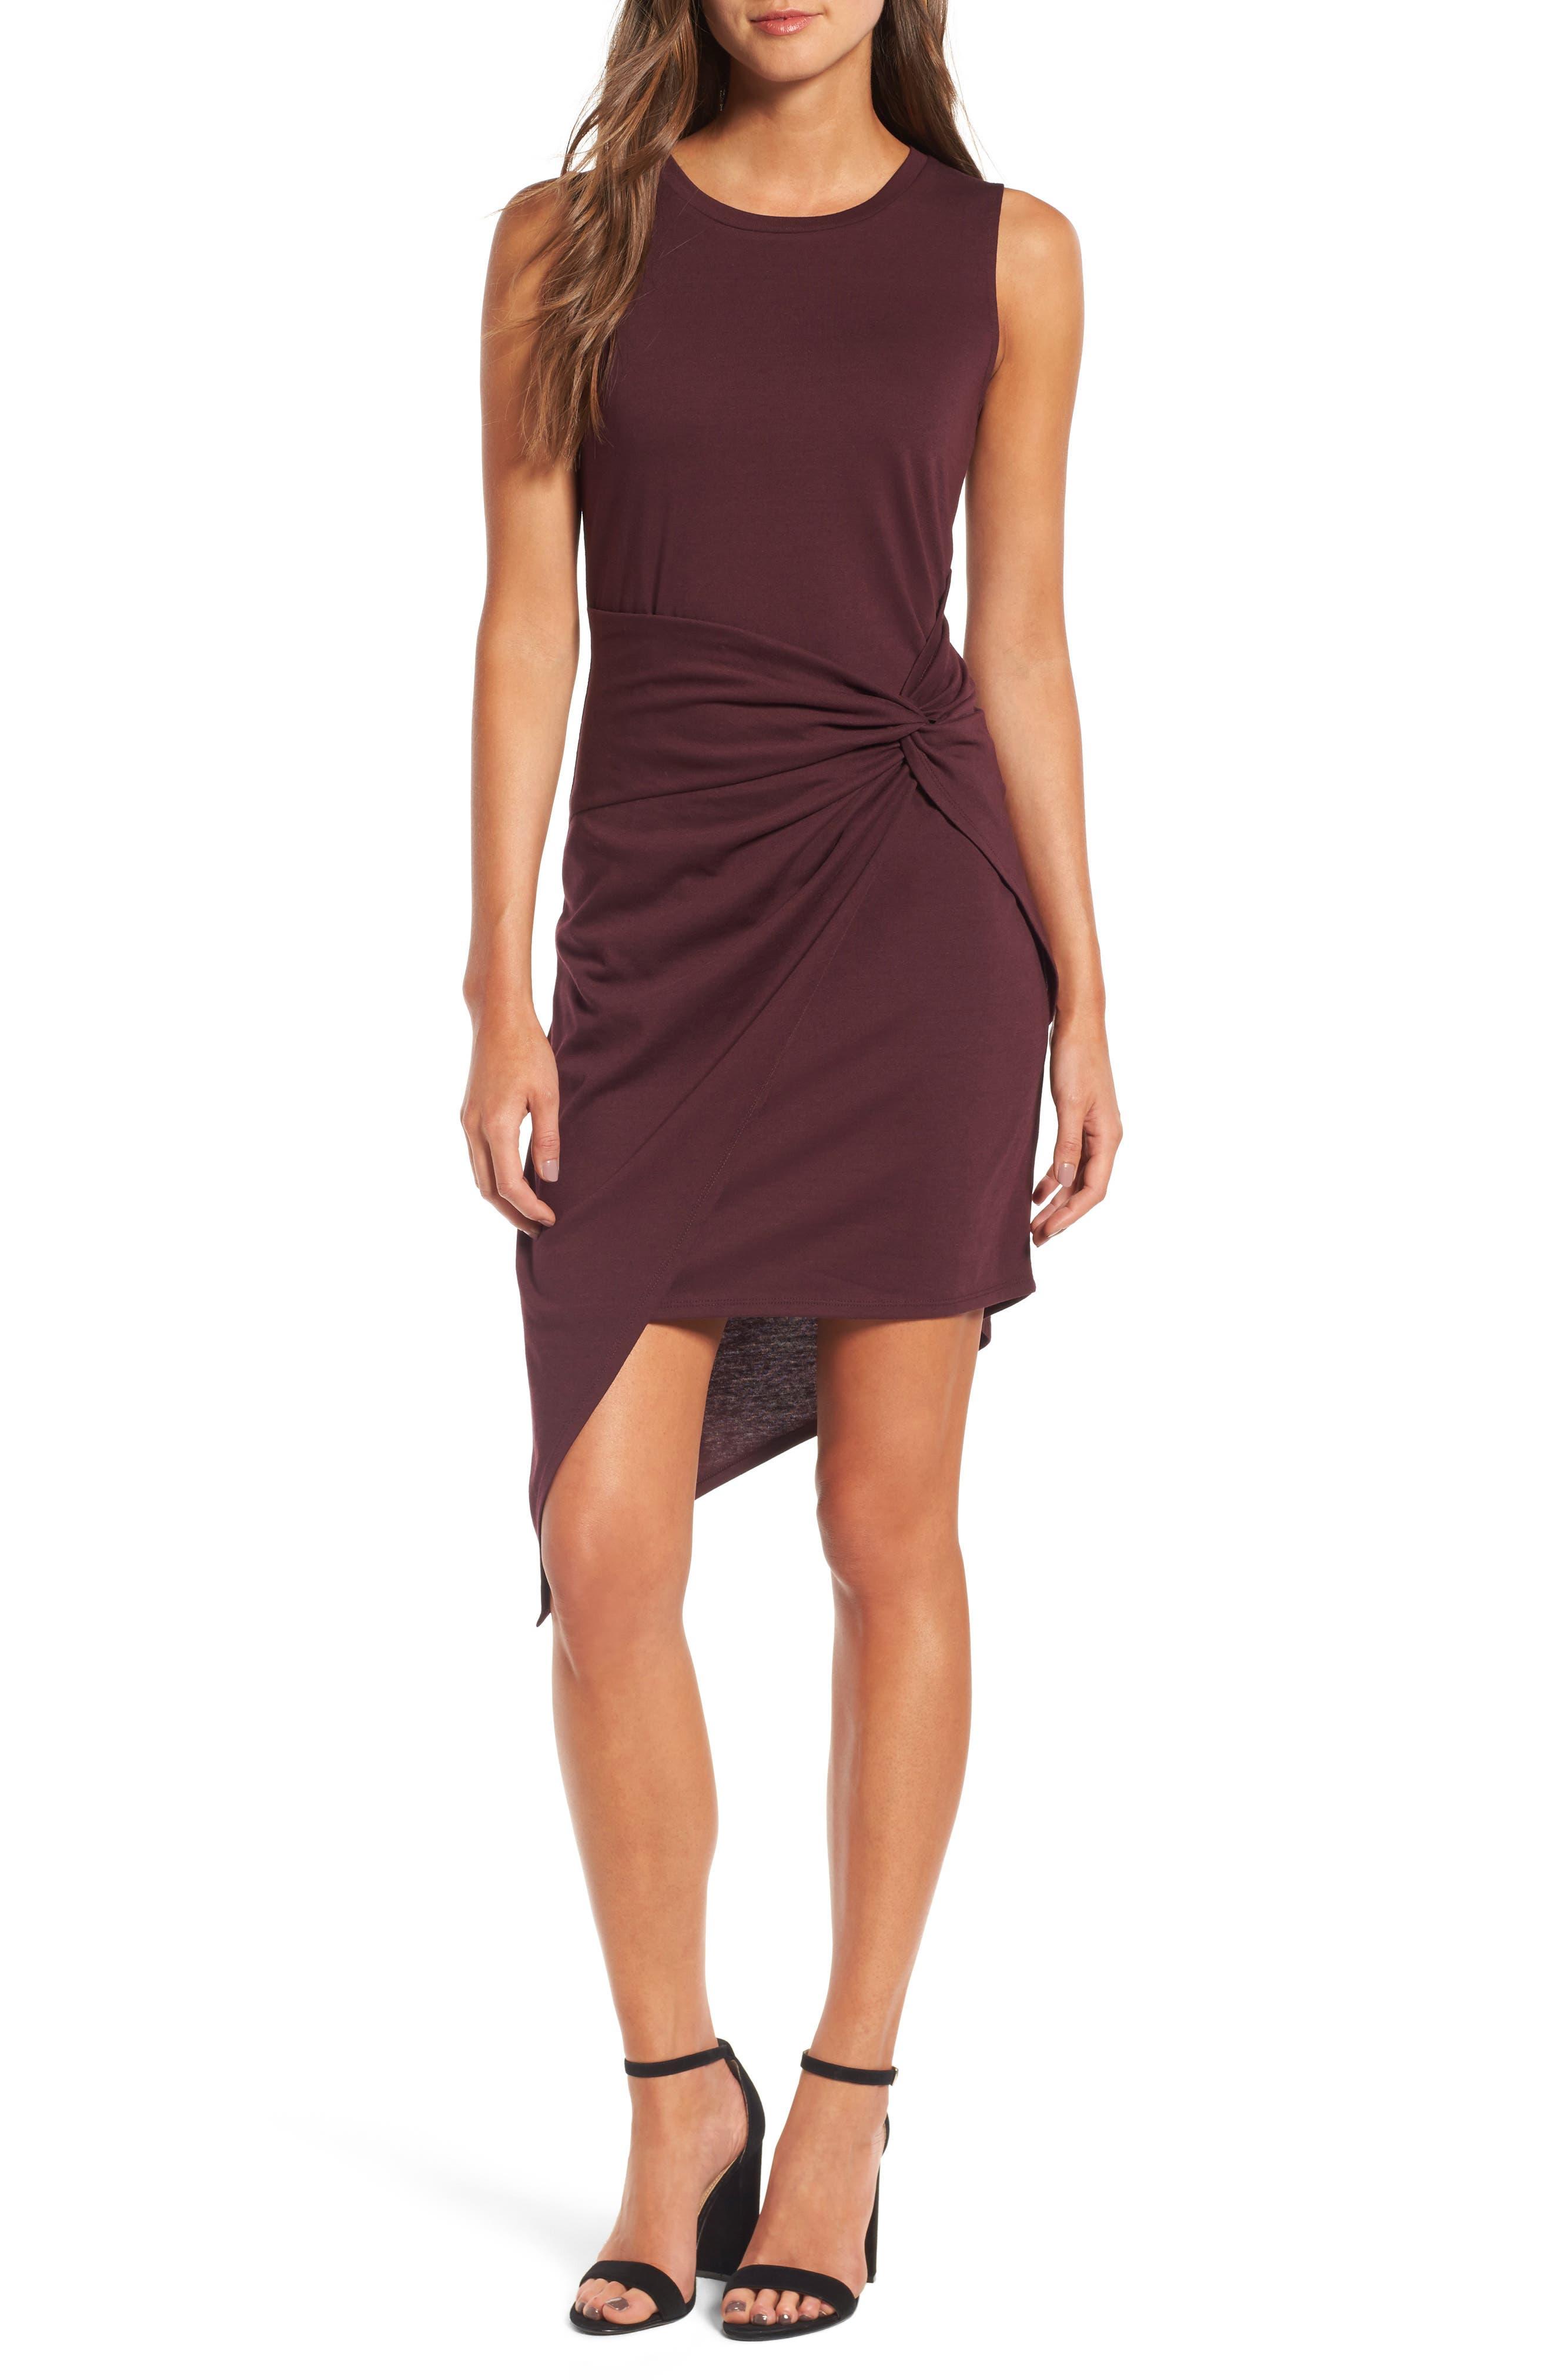 Chelsea28 Twist Front Dress, Burgundy